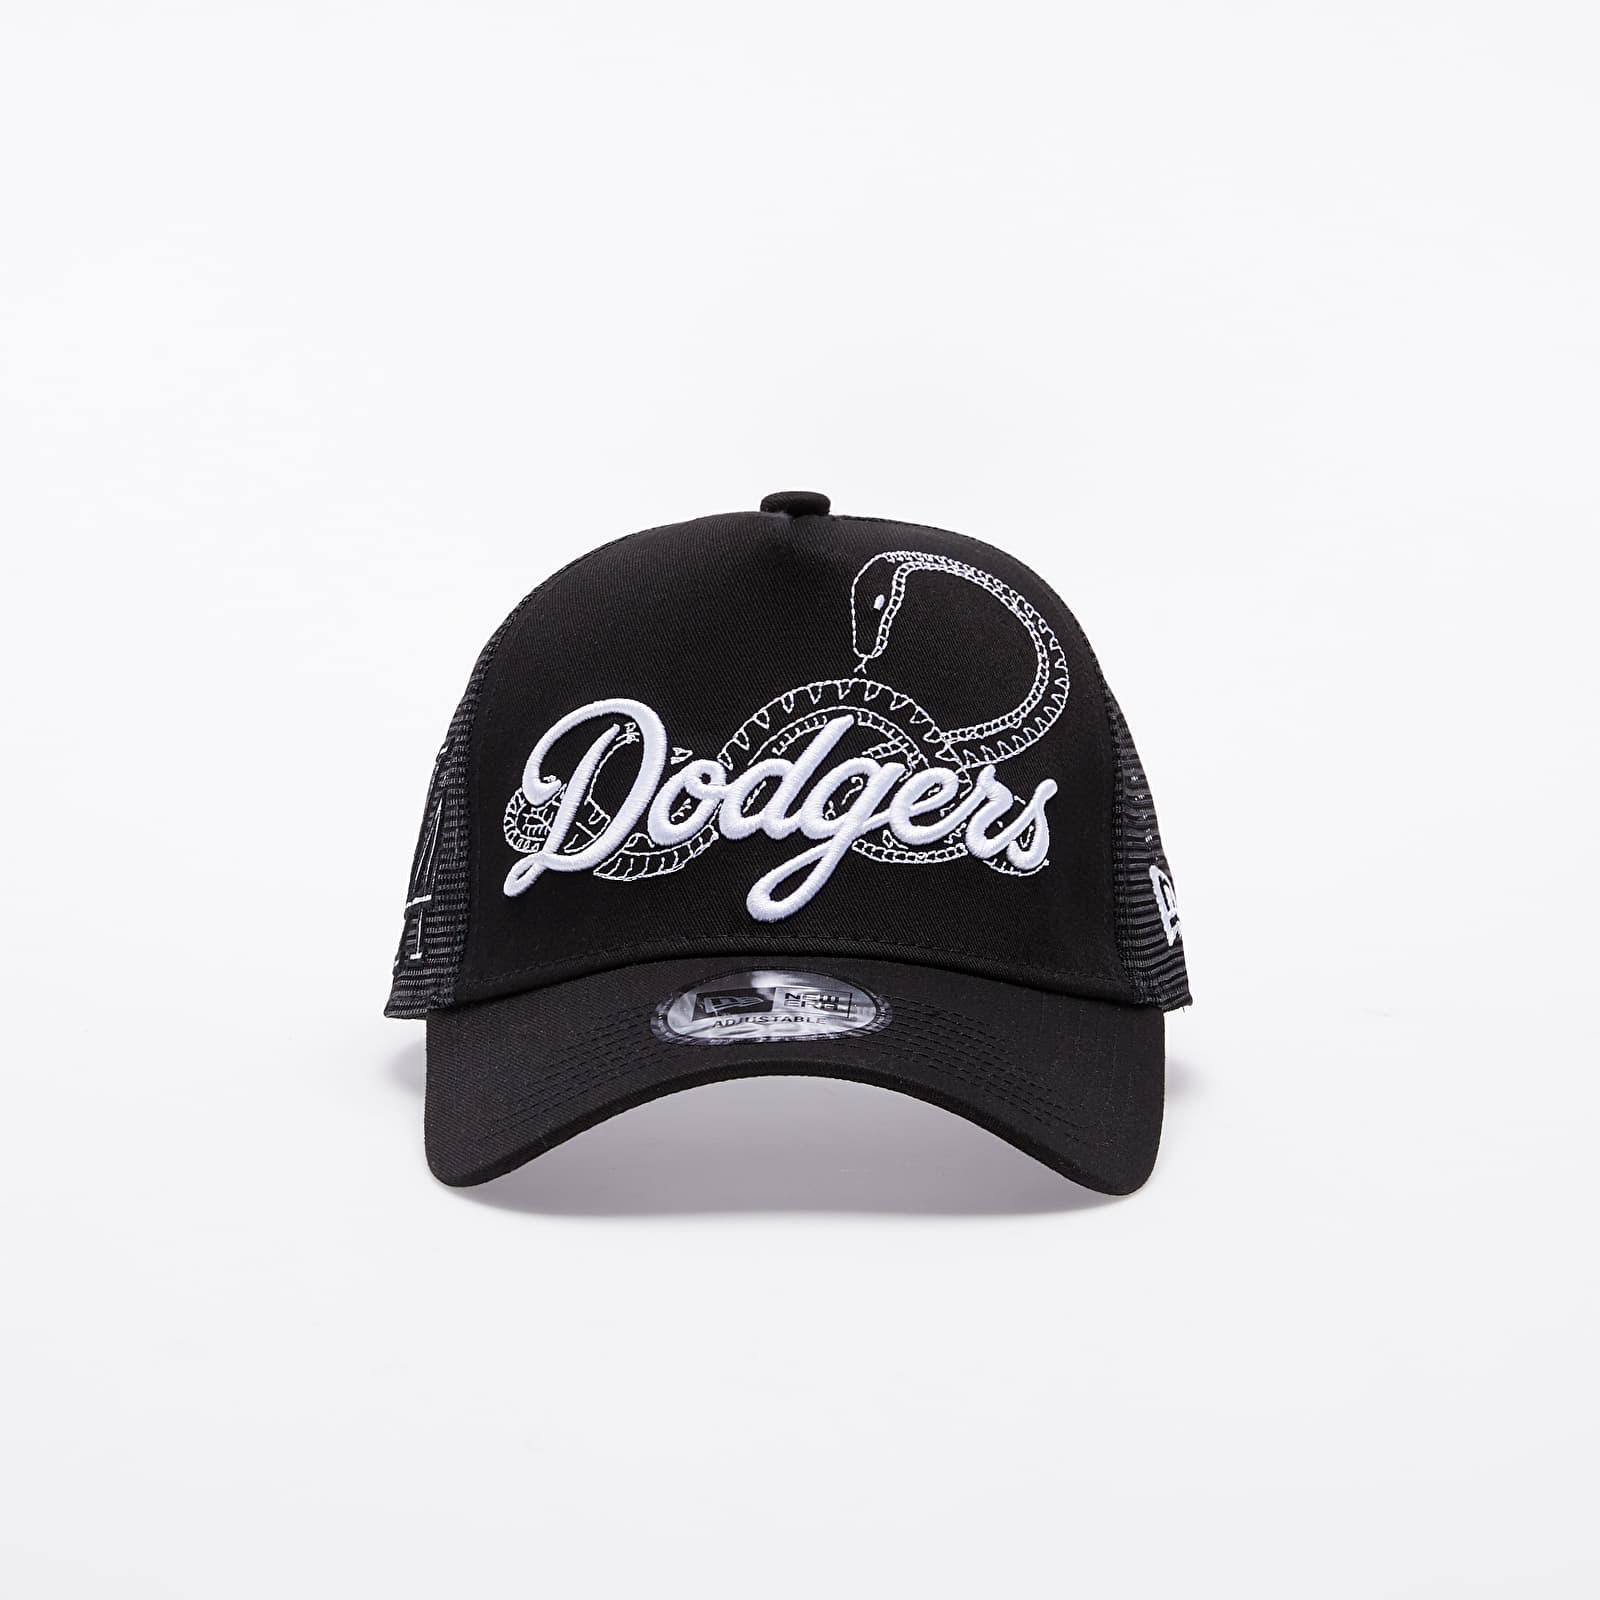 New Era MLB Tech Fabric License Los Angeles Dodgers Trucker